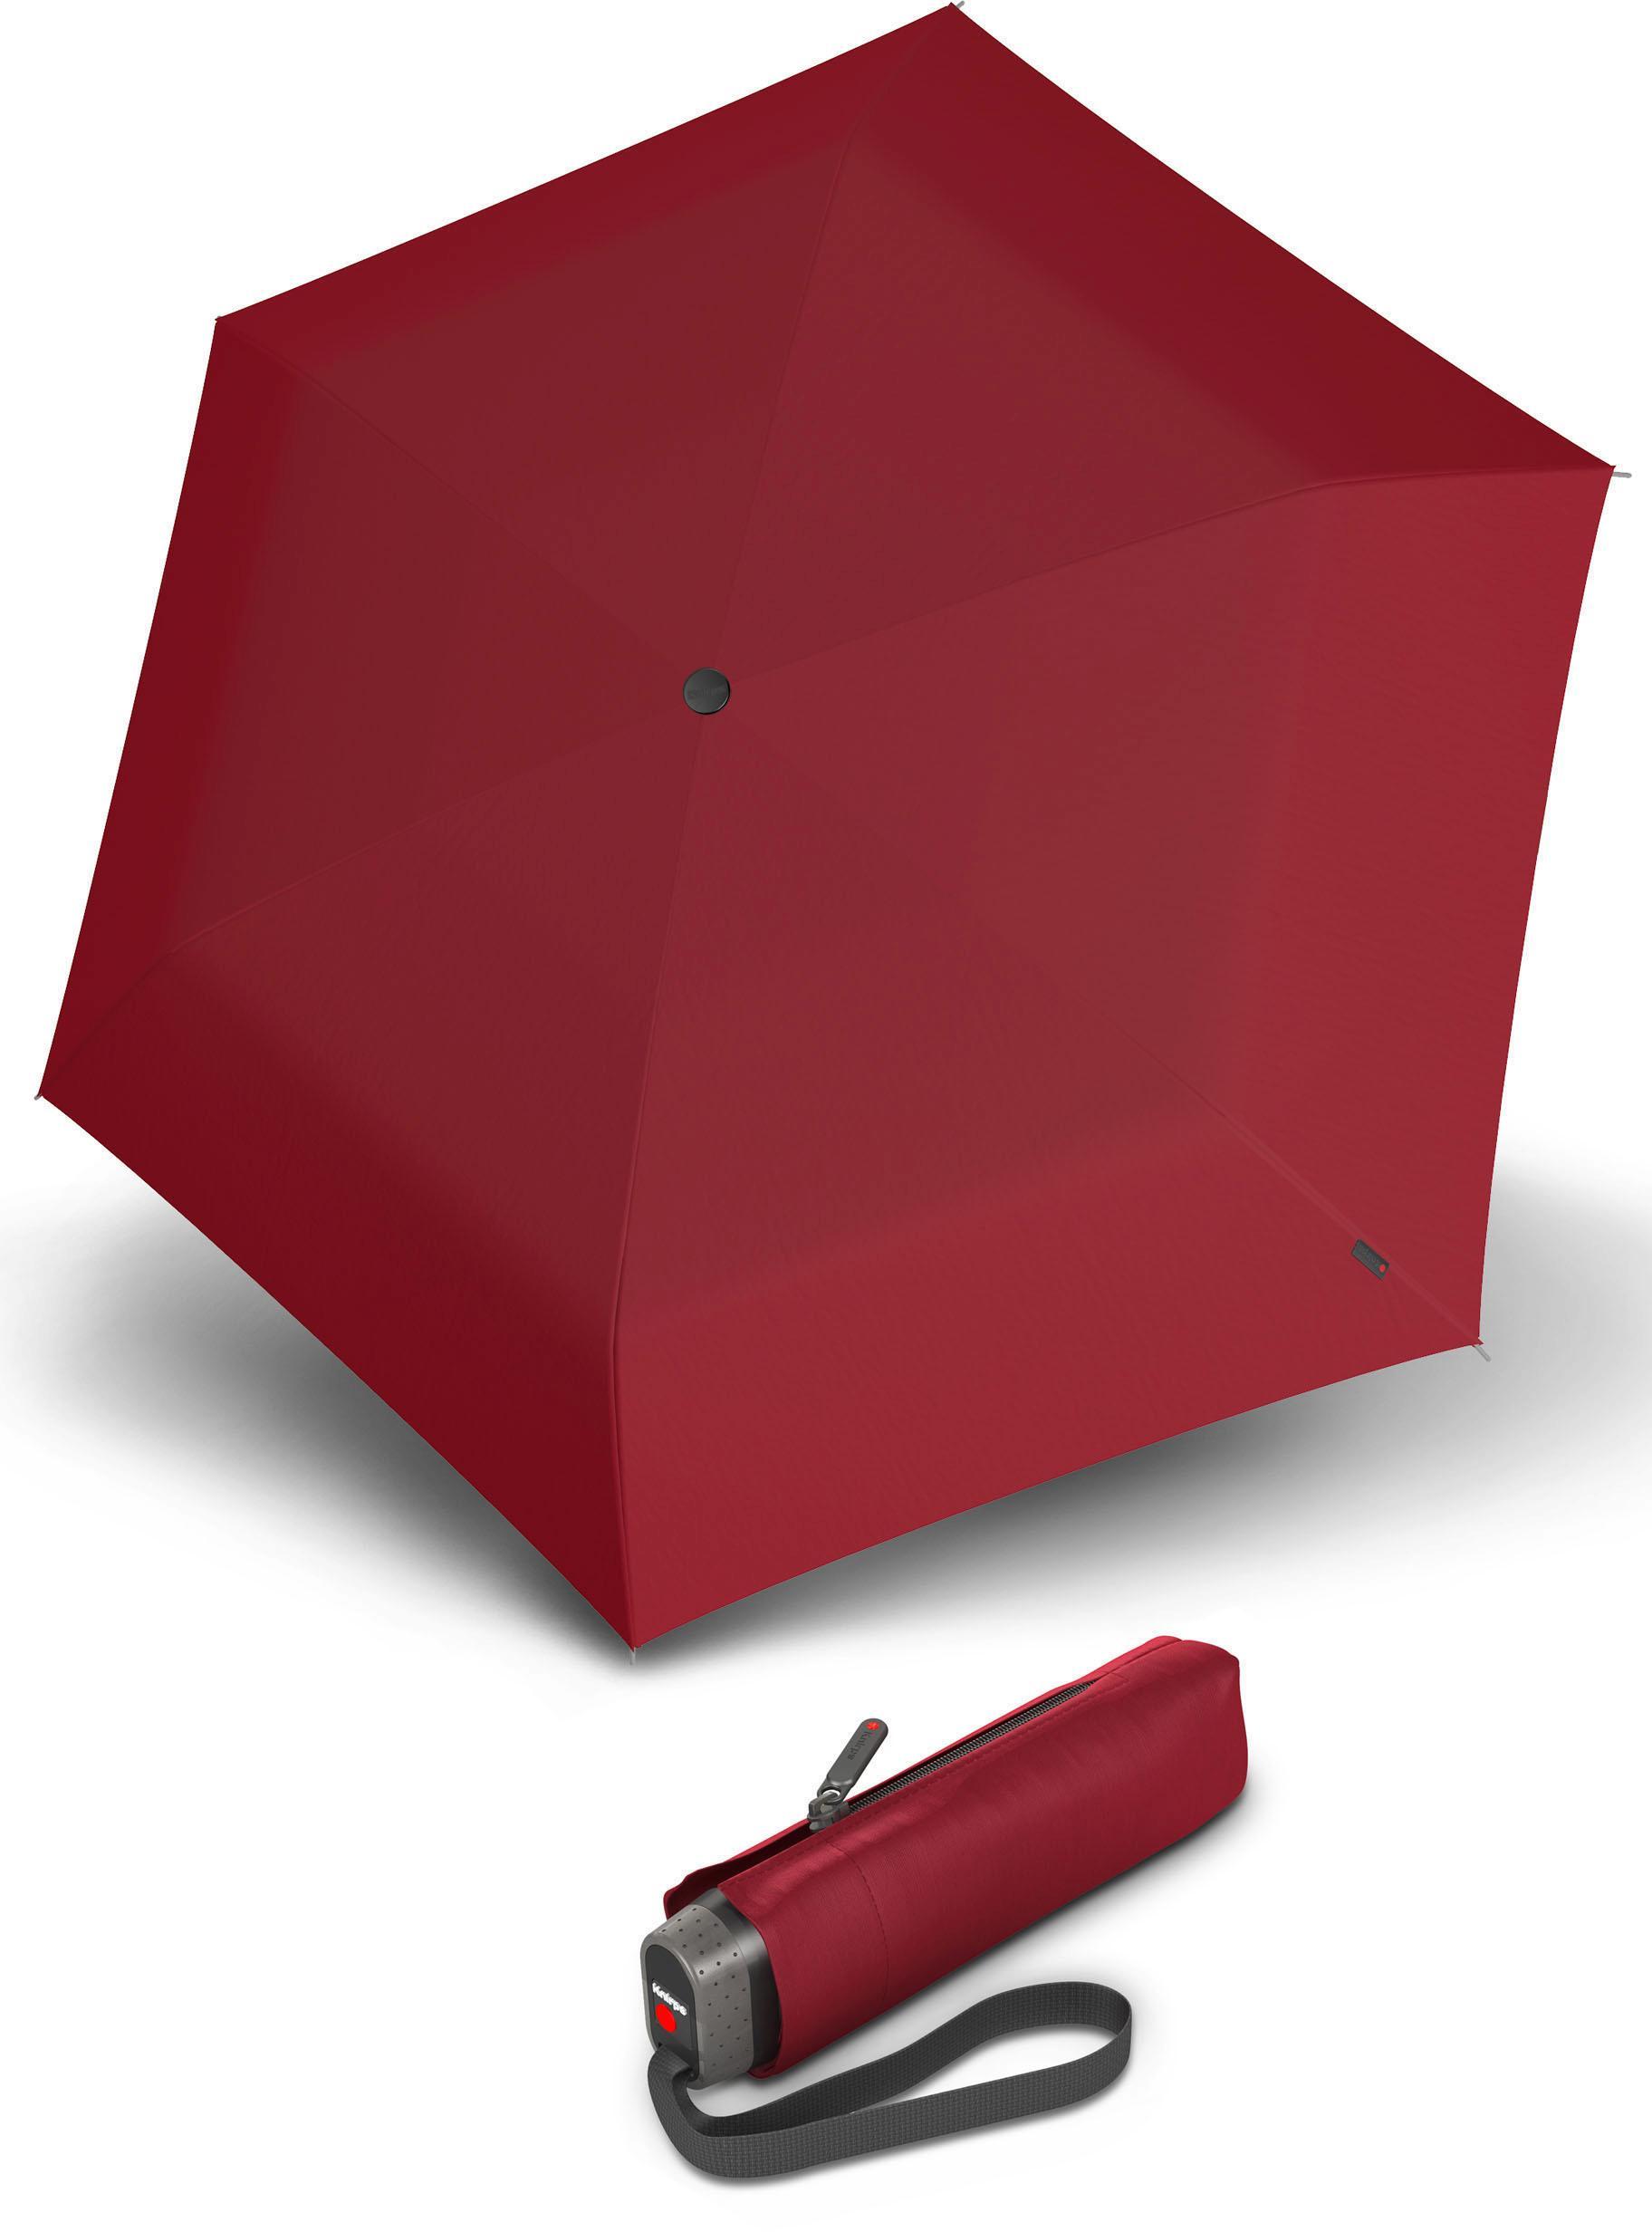 Knirps Taschenregenschirm ´´TS010 Slim Small Manual´´   Accessoires > Regenschirme > Sonstige Regenschirme   Rot   Knirps